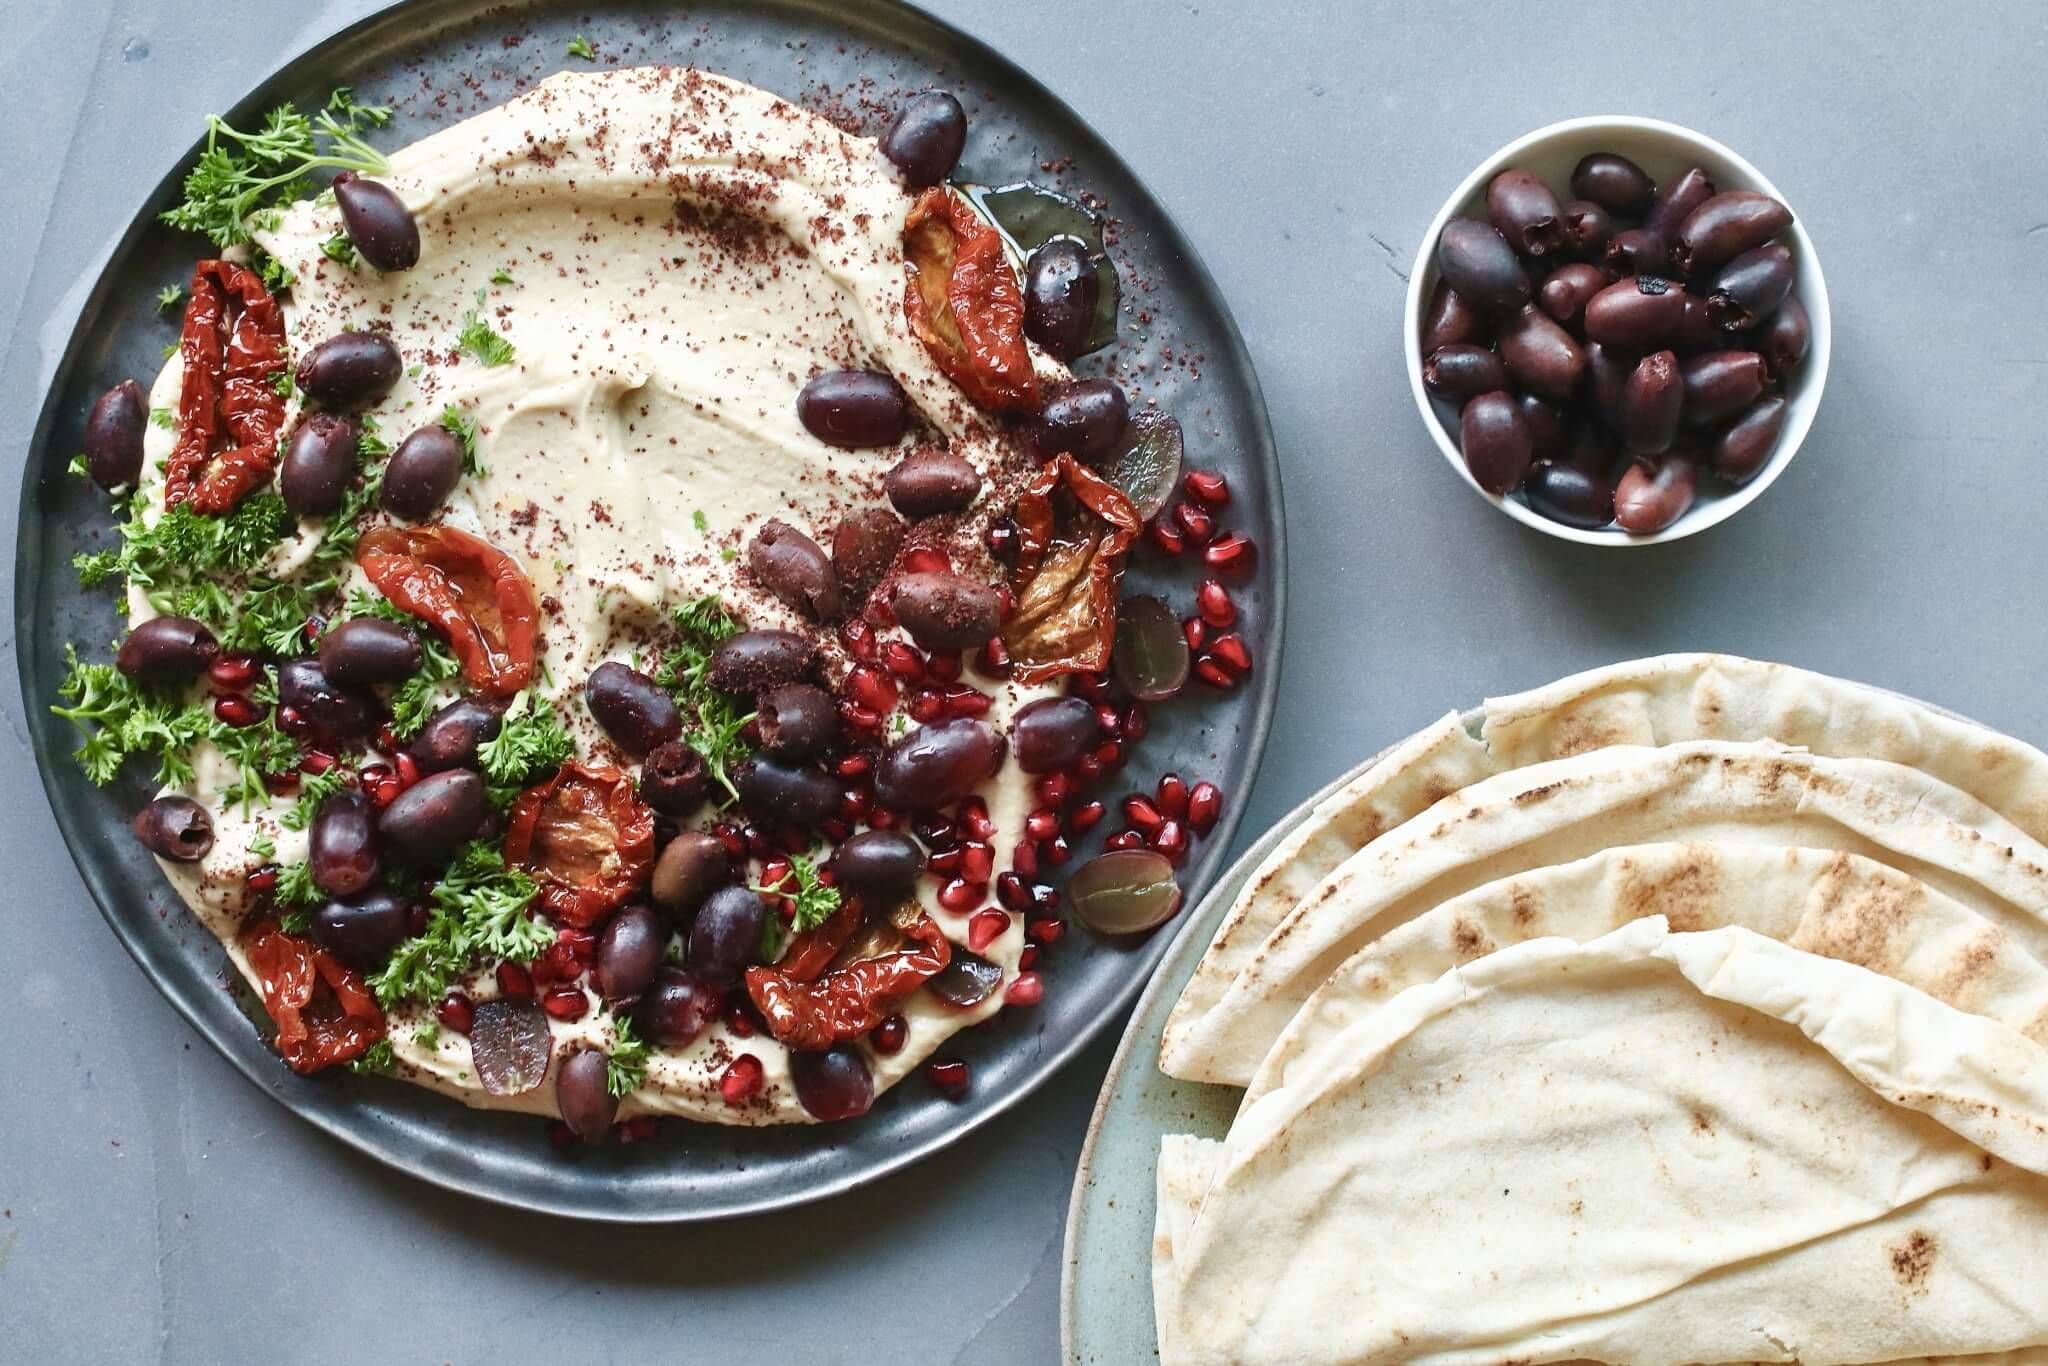 Hummus party plateau, Gezonde borrelhappen, Glutenvrije borrelhappen, Beaufood recepten, Gezonde foodblogs, Leuke borrelhapjes, Slanken borrelhapjes